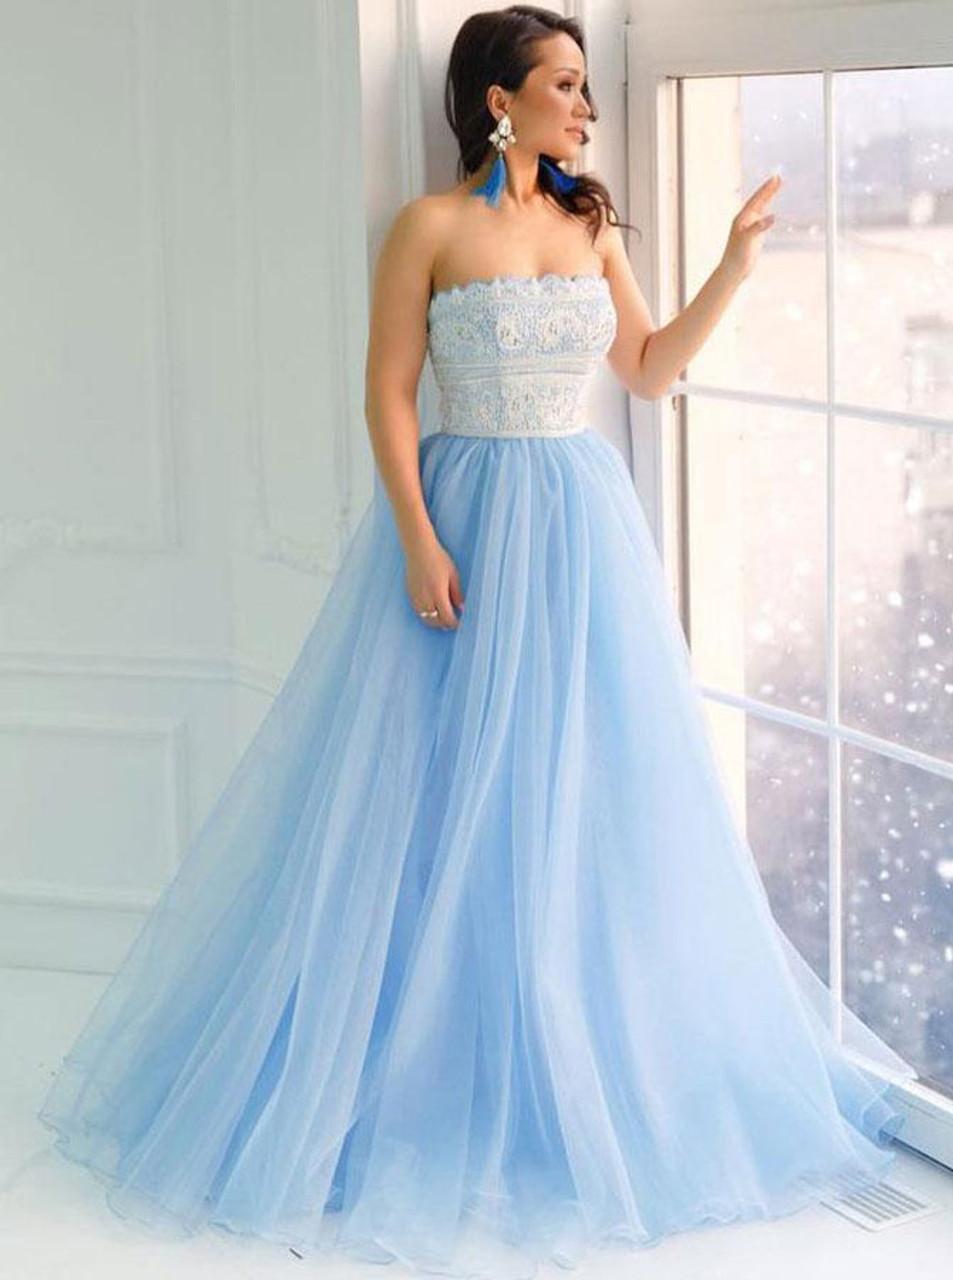 Strapless Banquet Dresses